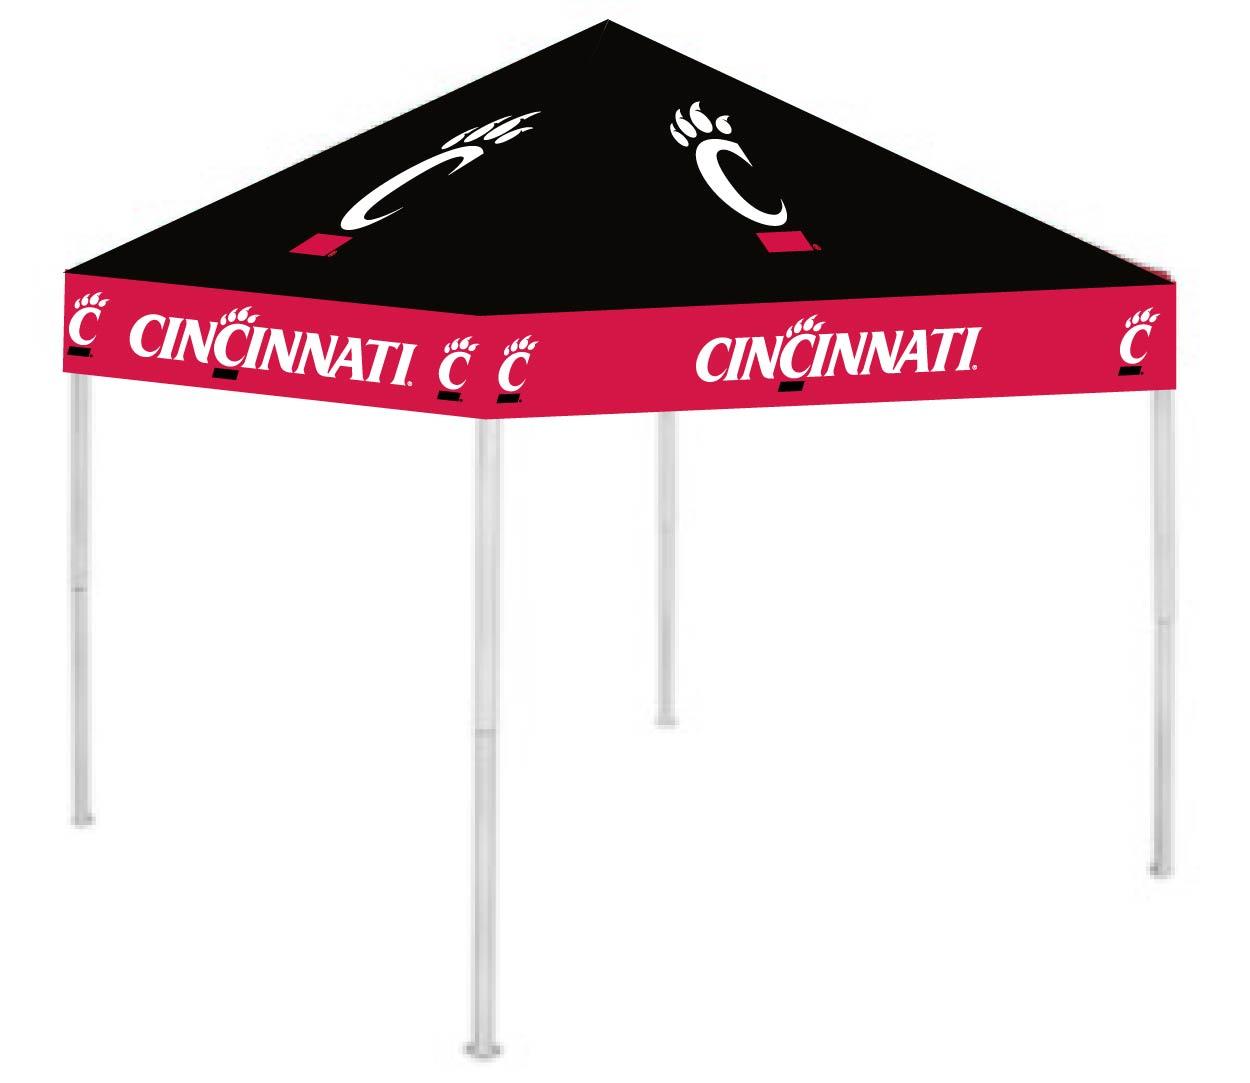 Cincinnati Bearcats 9u0027 x 9u0027 Ultimate Tailgate Shade Canopy / Tent (RIV-  sc 1 st  Best Deals Rebates and Coupons & Canopy Tent - USA